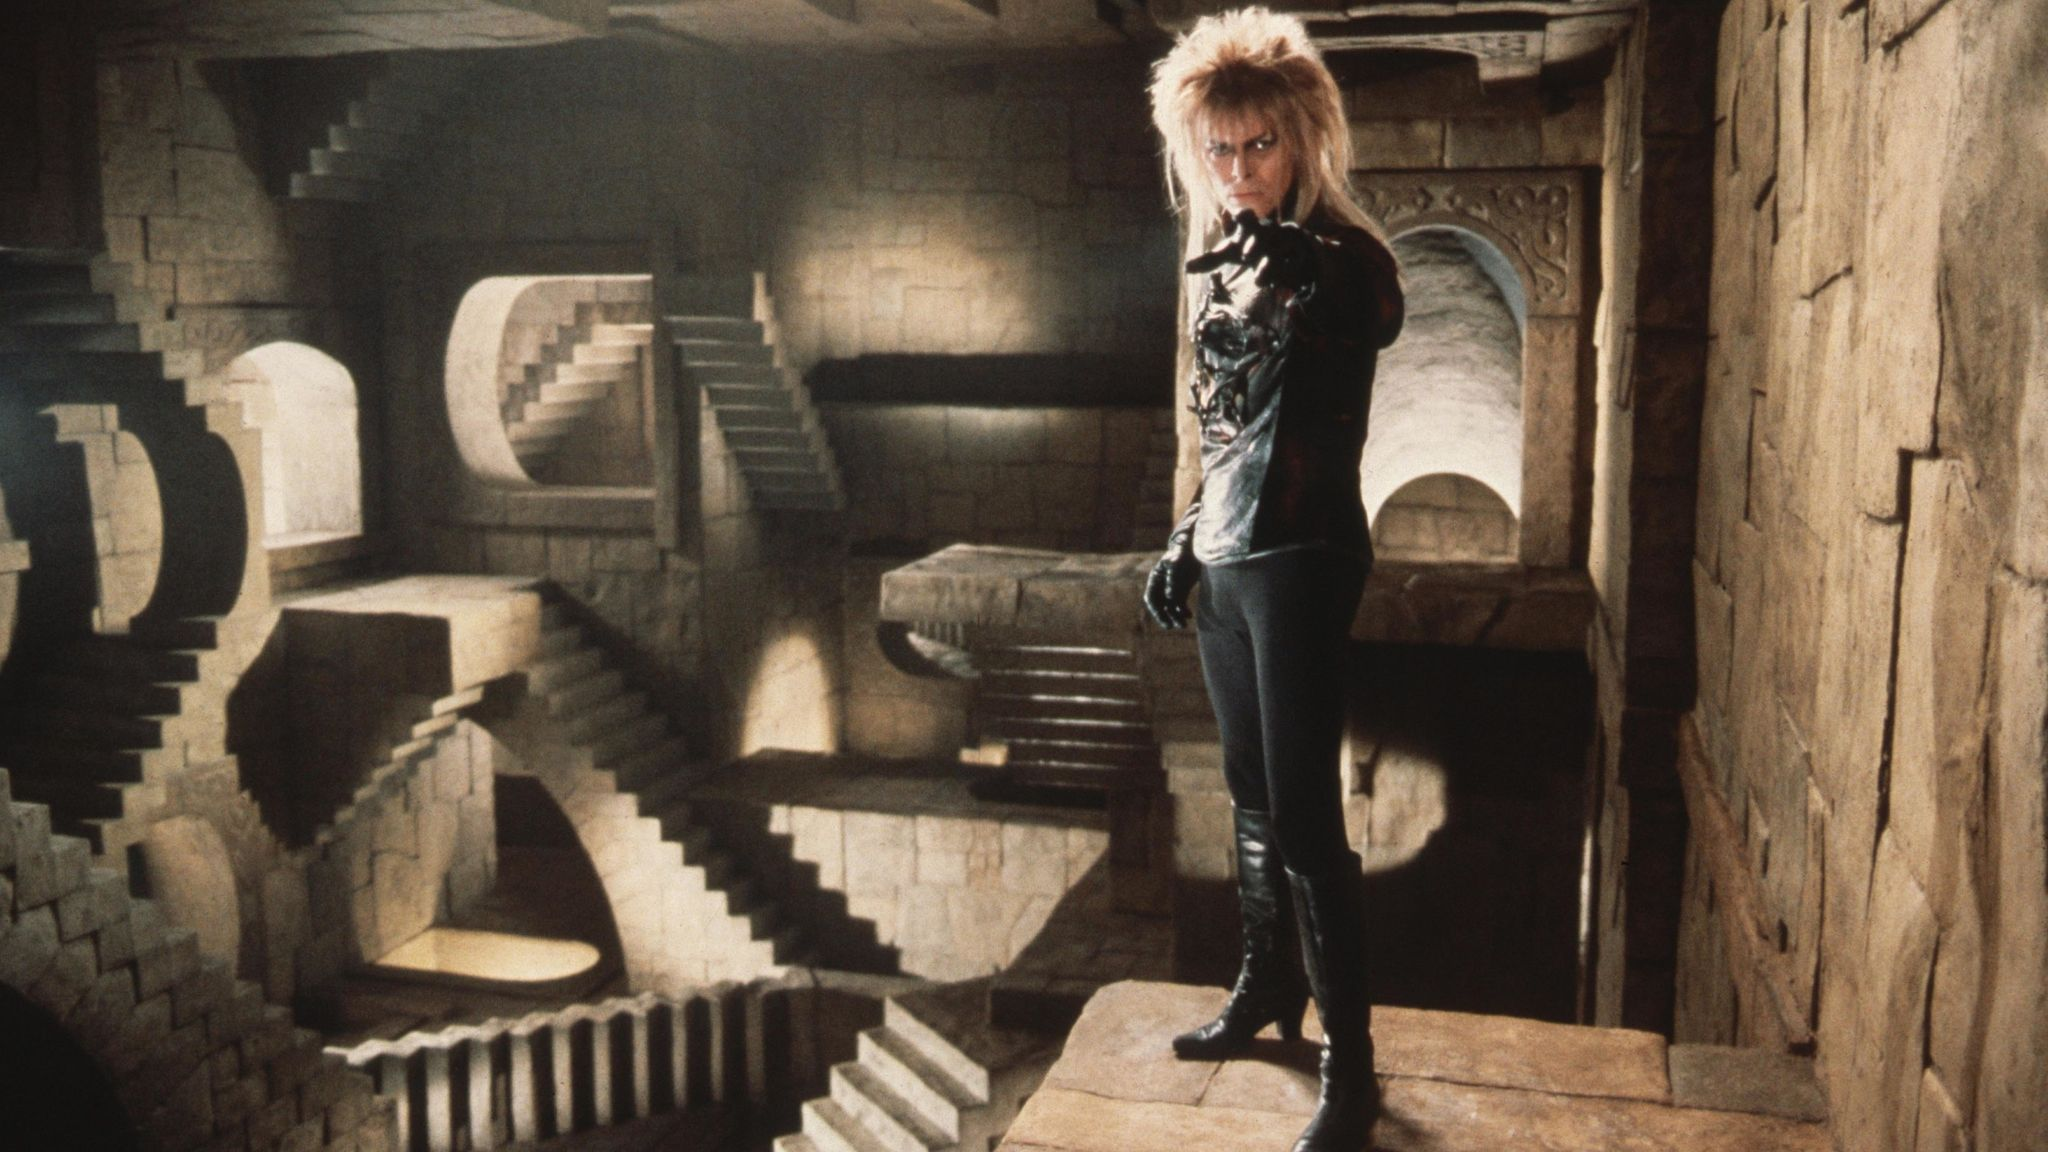 David Bowie. Pic: Jim Henson Productions/Kobal/Shutterstock